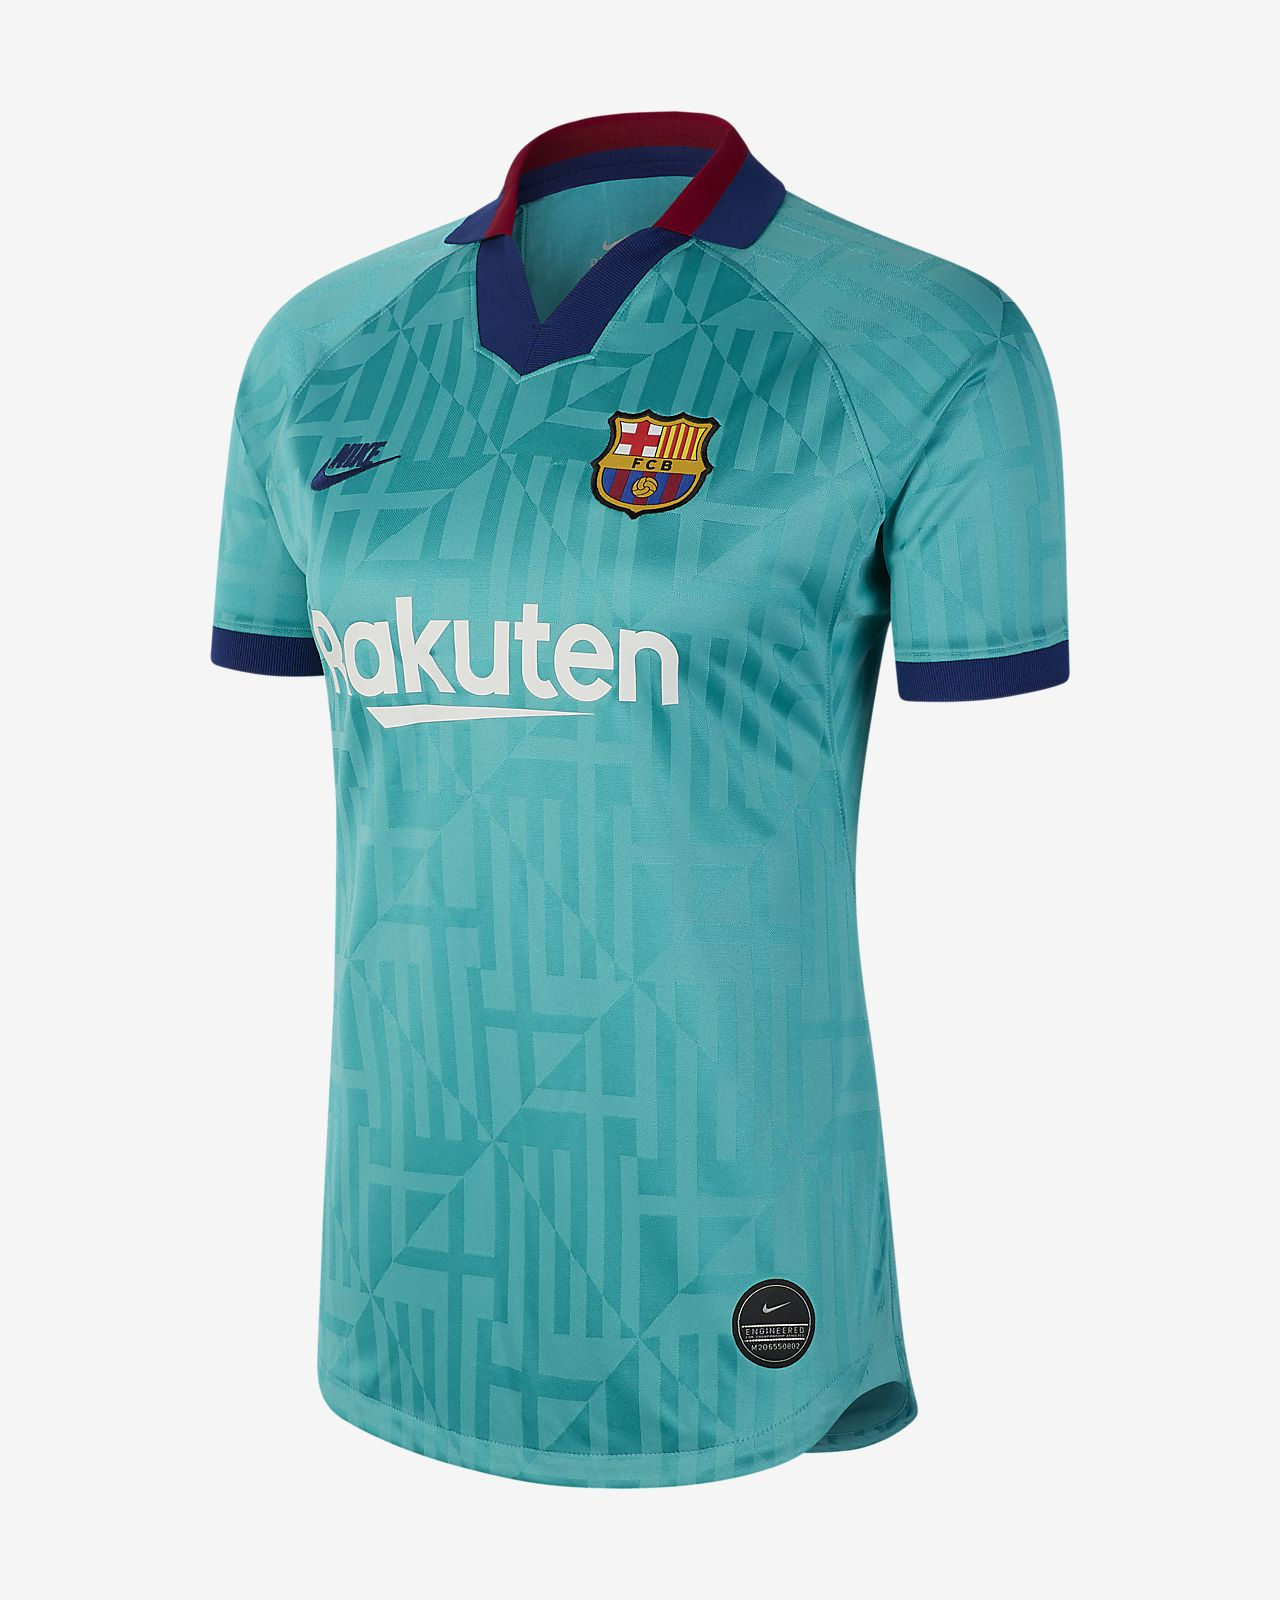 Camiseta alternativa de futbol para mujer Stadium 2019/20 del FC Barcelona